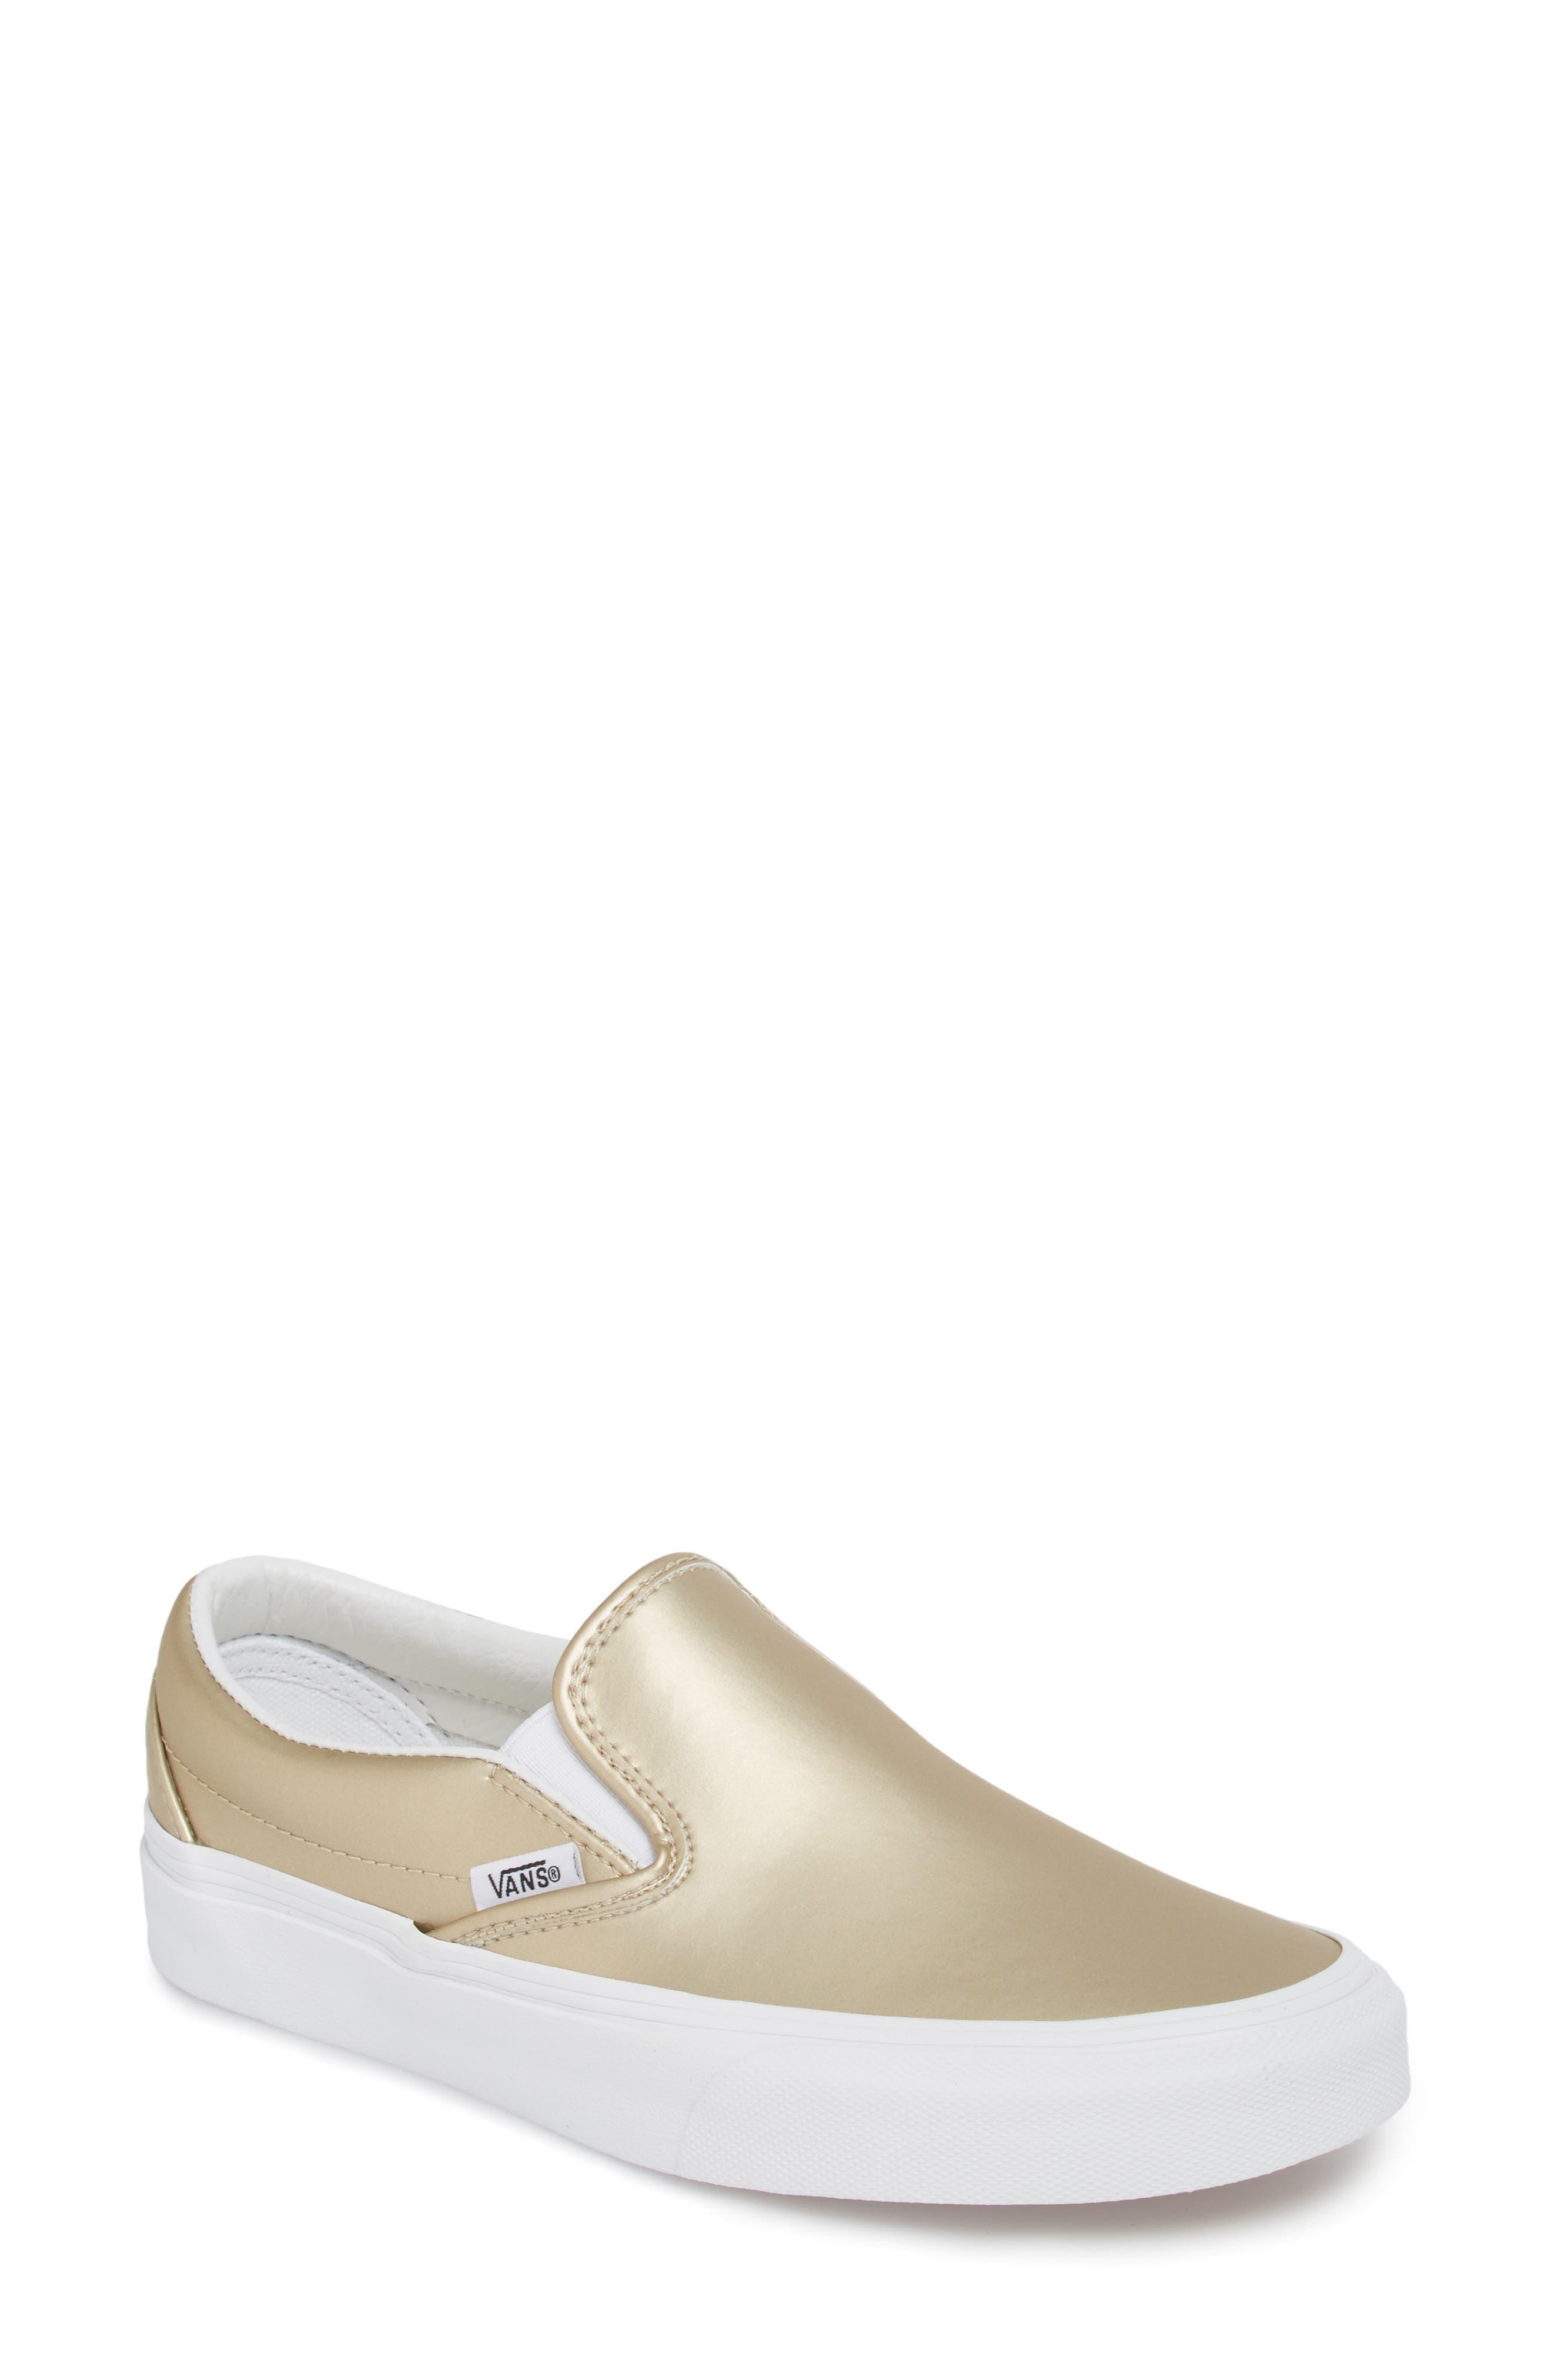 ,                             Classic Slip-On Sneaker,                             Main thumbnail 231, color,                             711